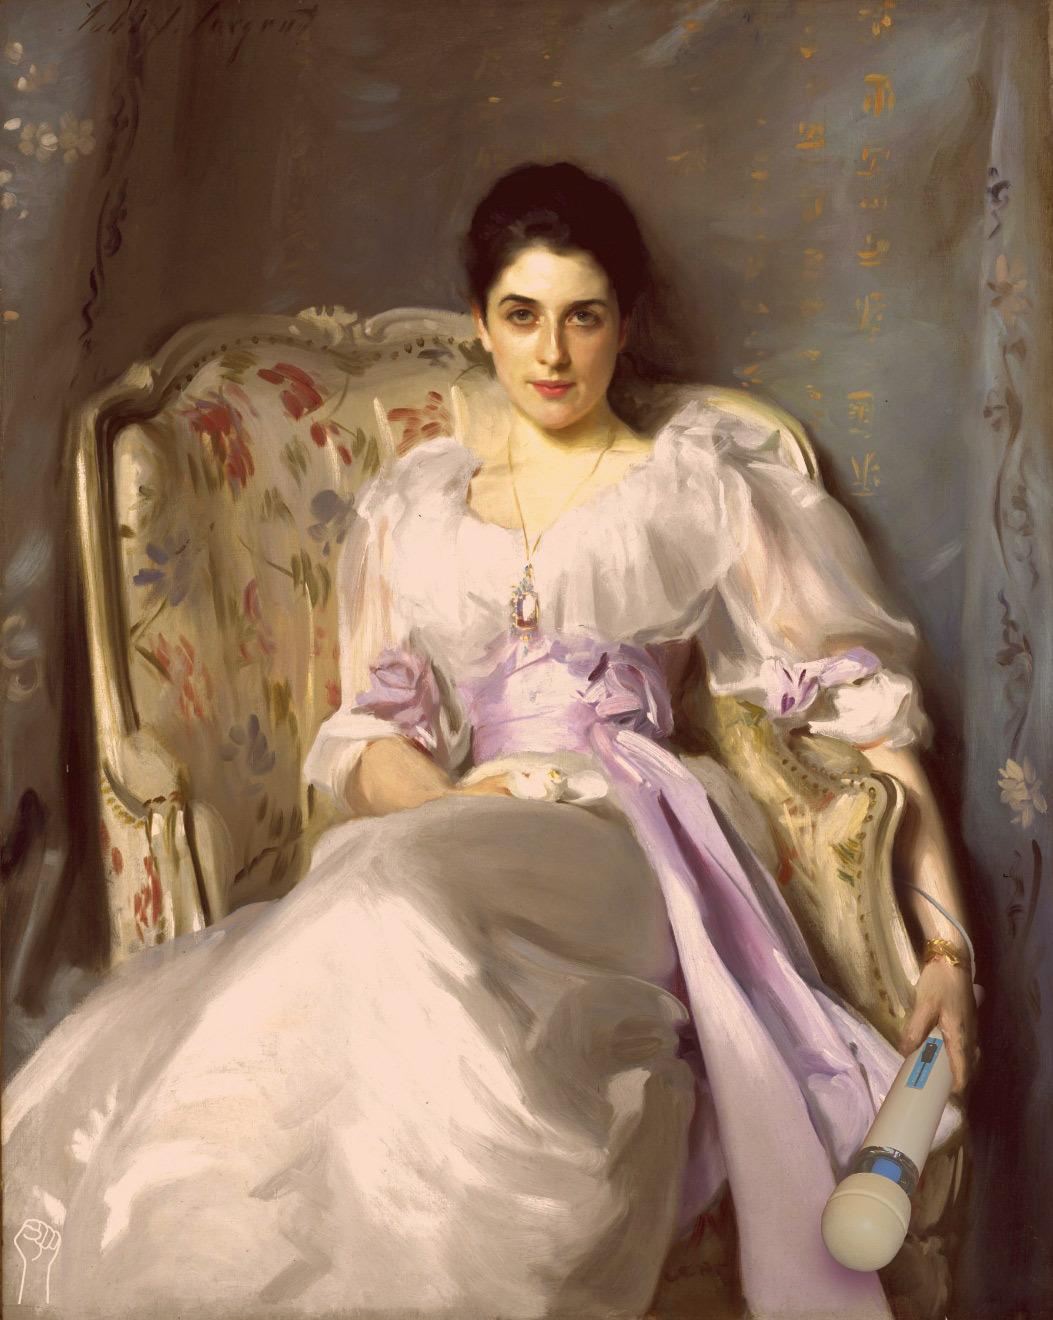 Lady Agnew of Hitachi by John Singer Sargent.